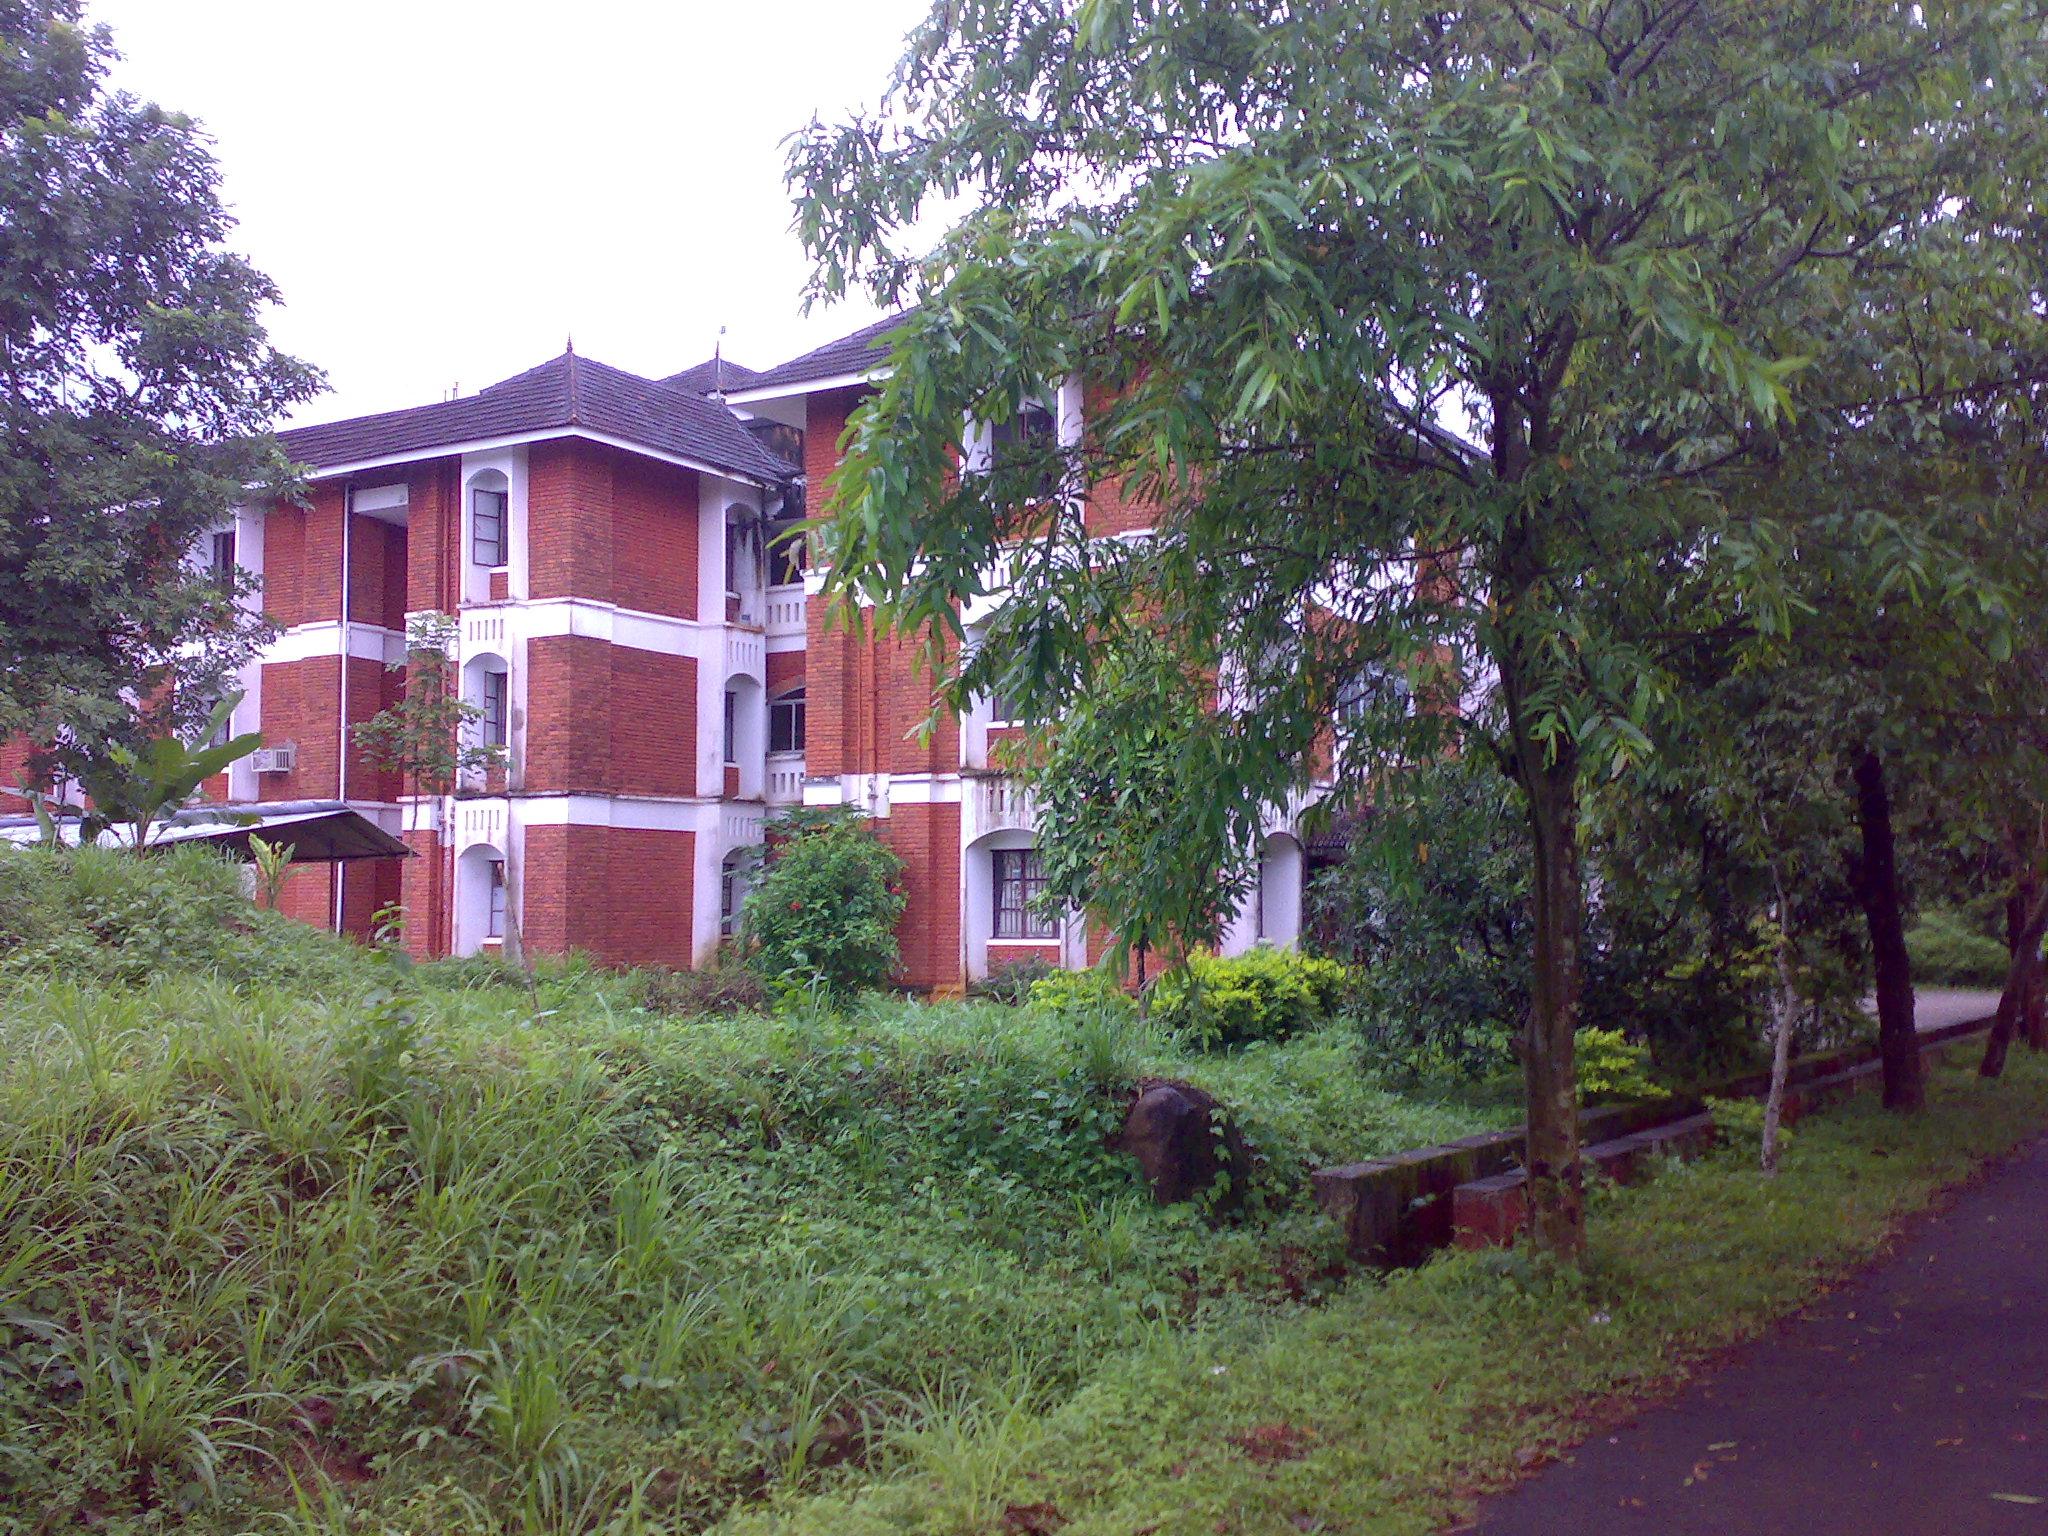 File:M.G. University College of Engineering.jpg - Wikimedia Commons